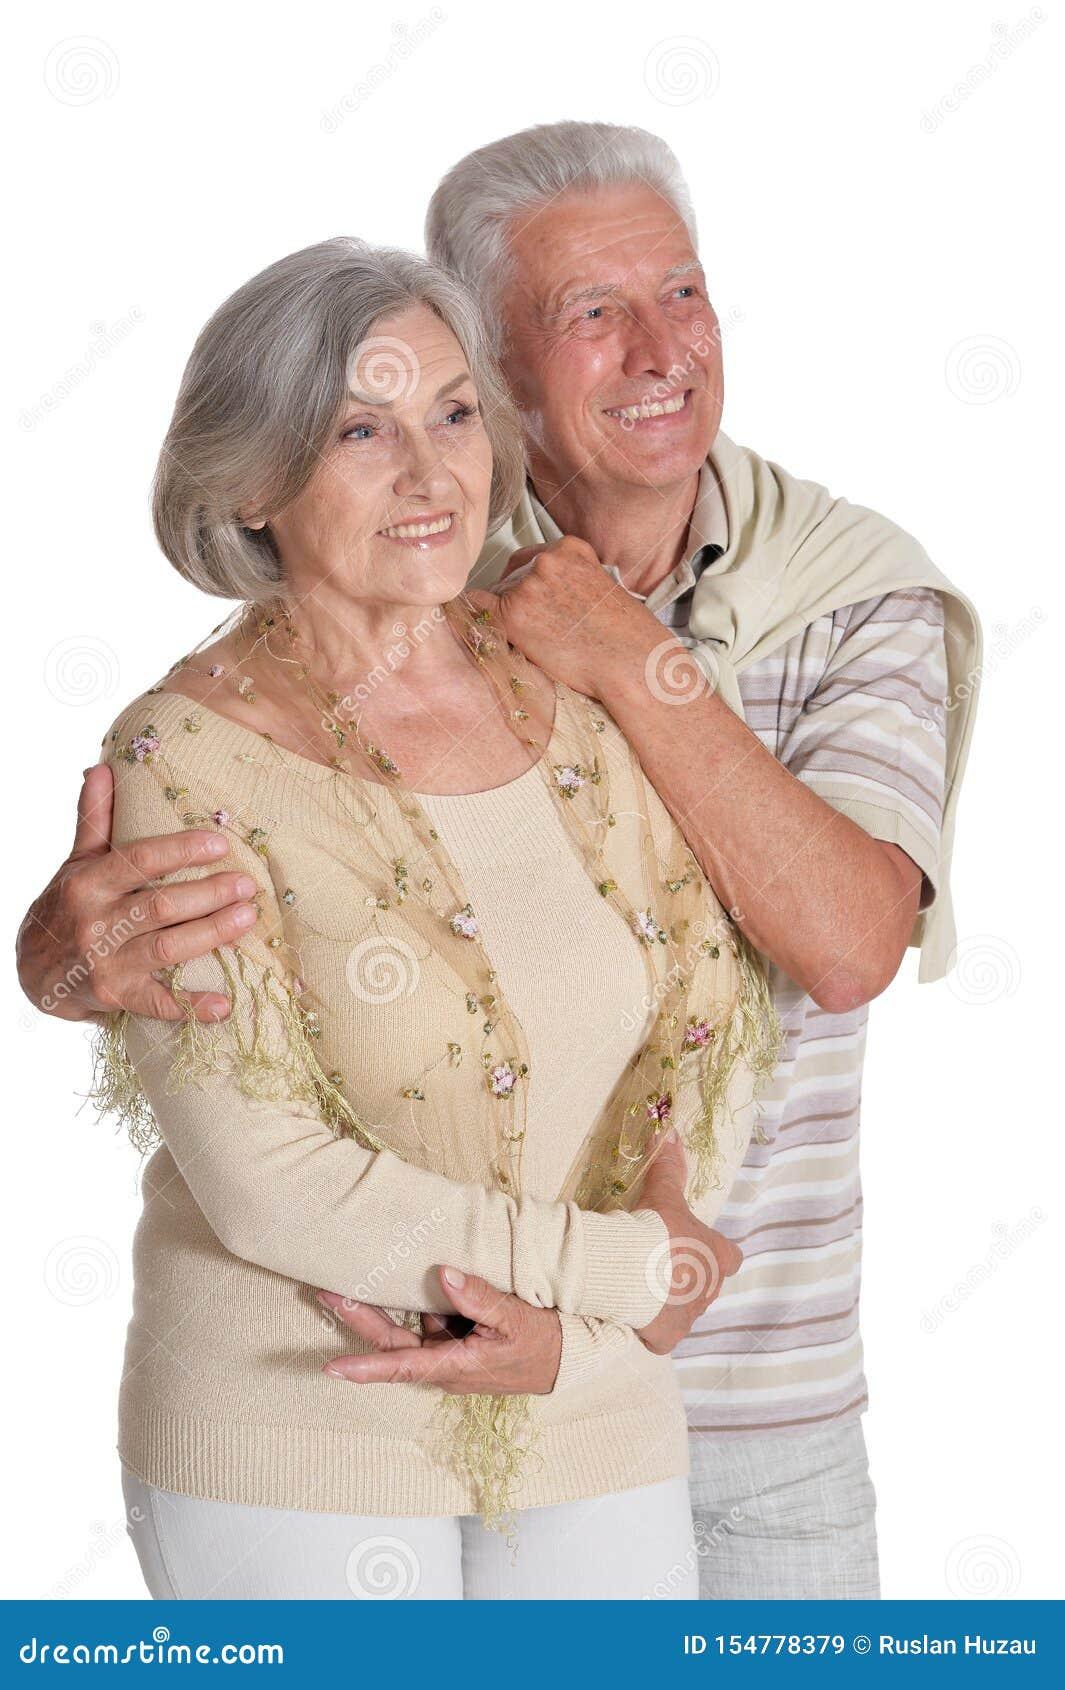 St?ende av lyckliga h?ga par som kramar p? vit bakgrund